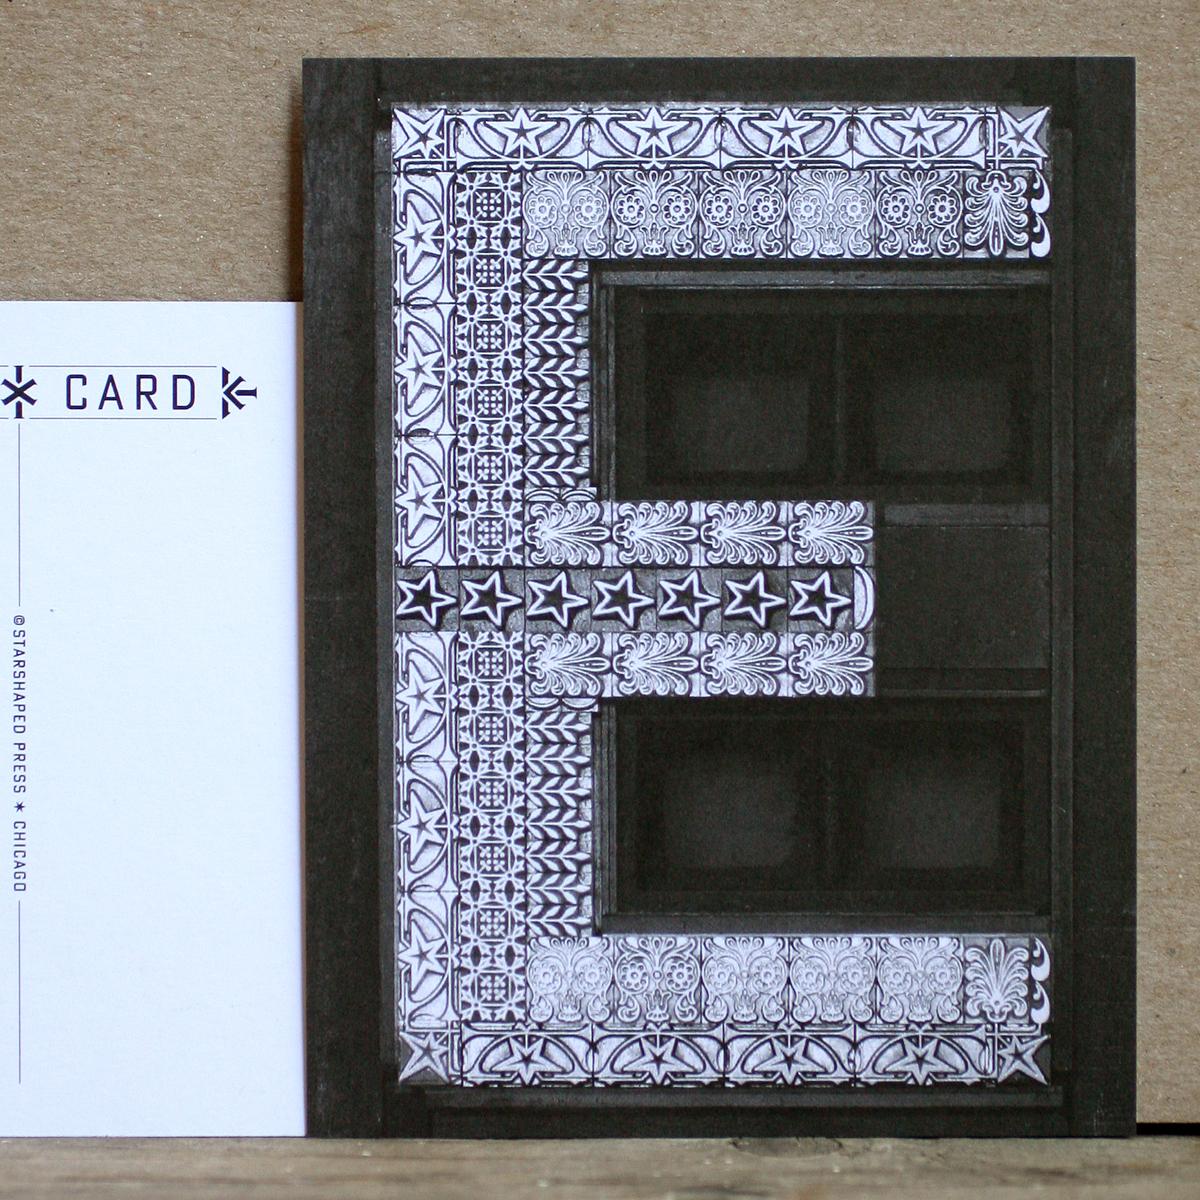 Epostcard